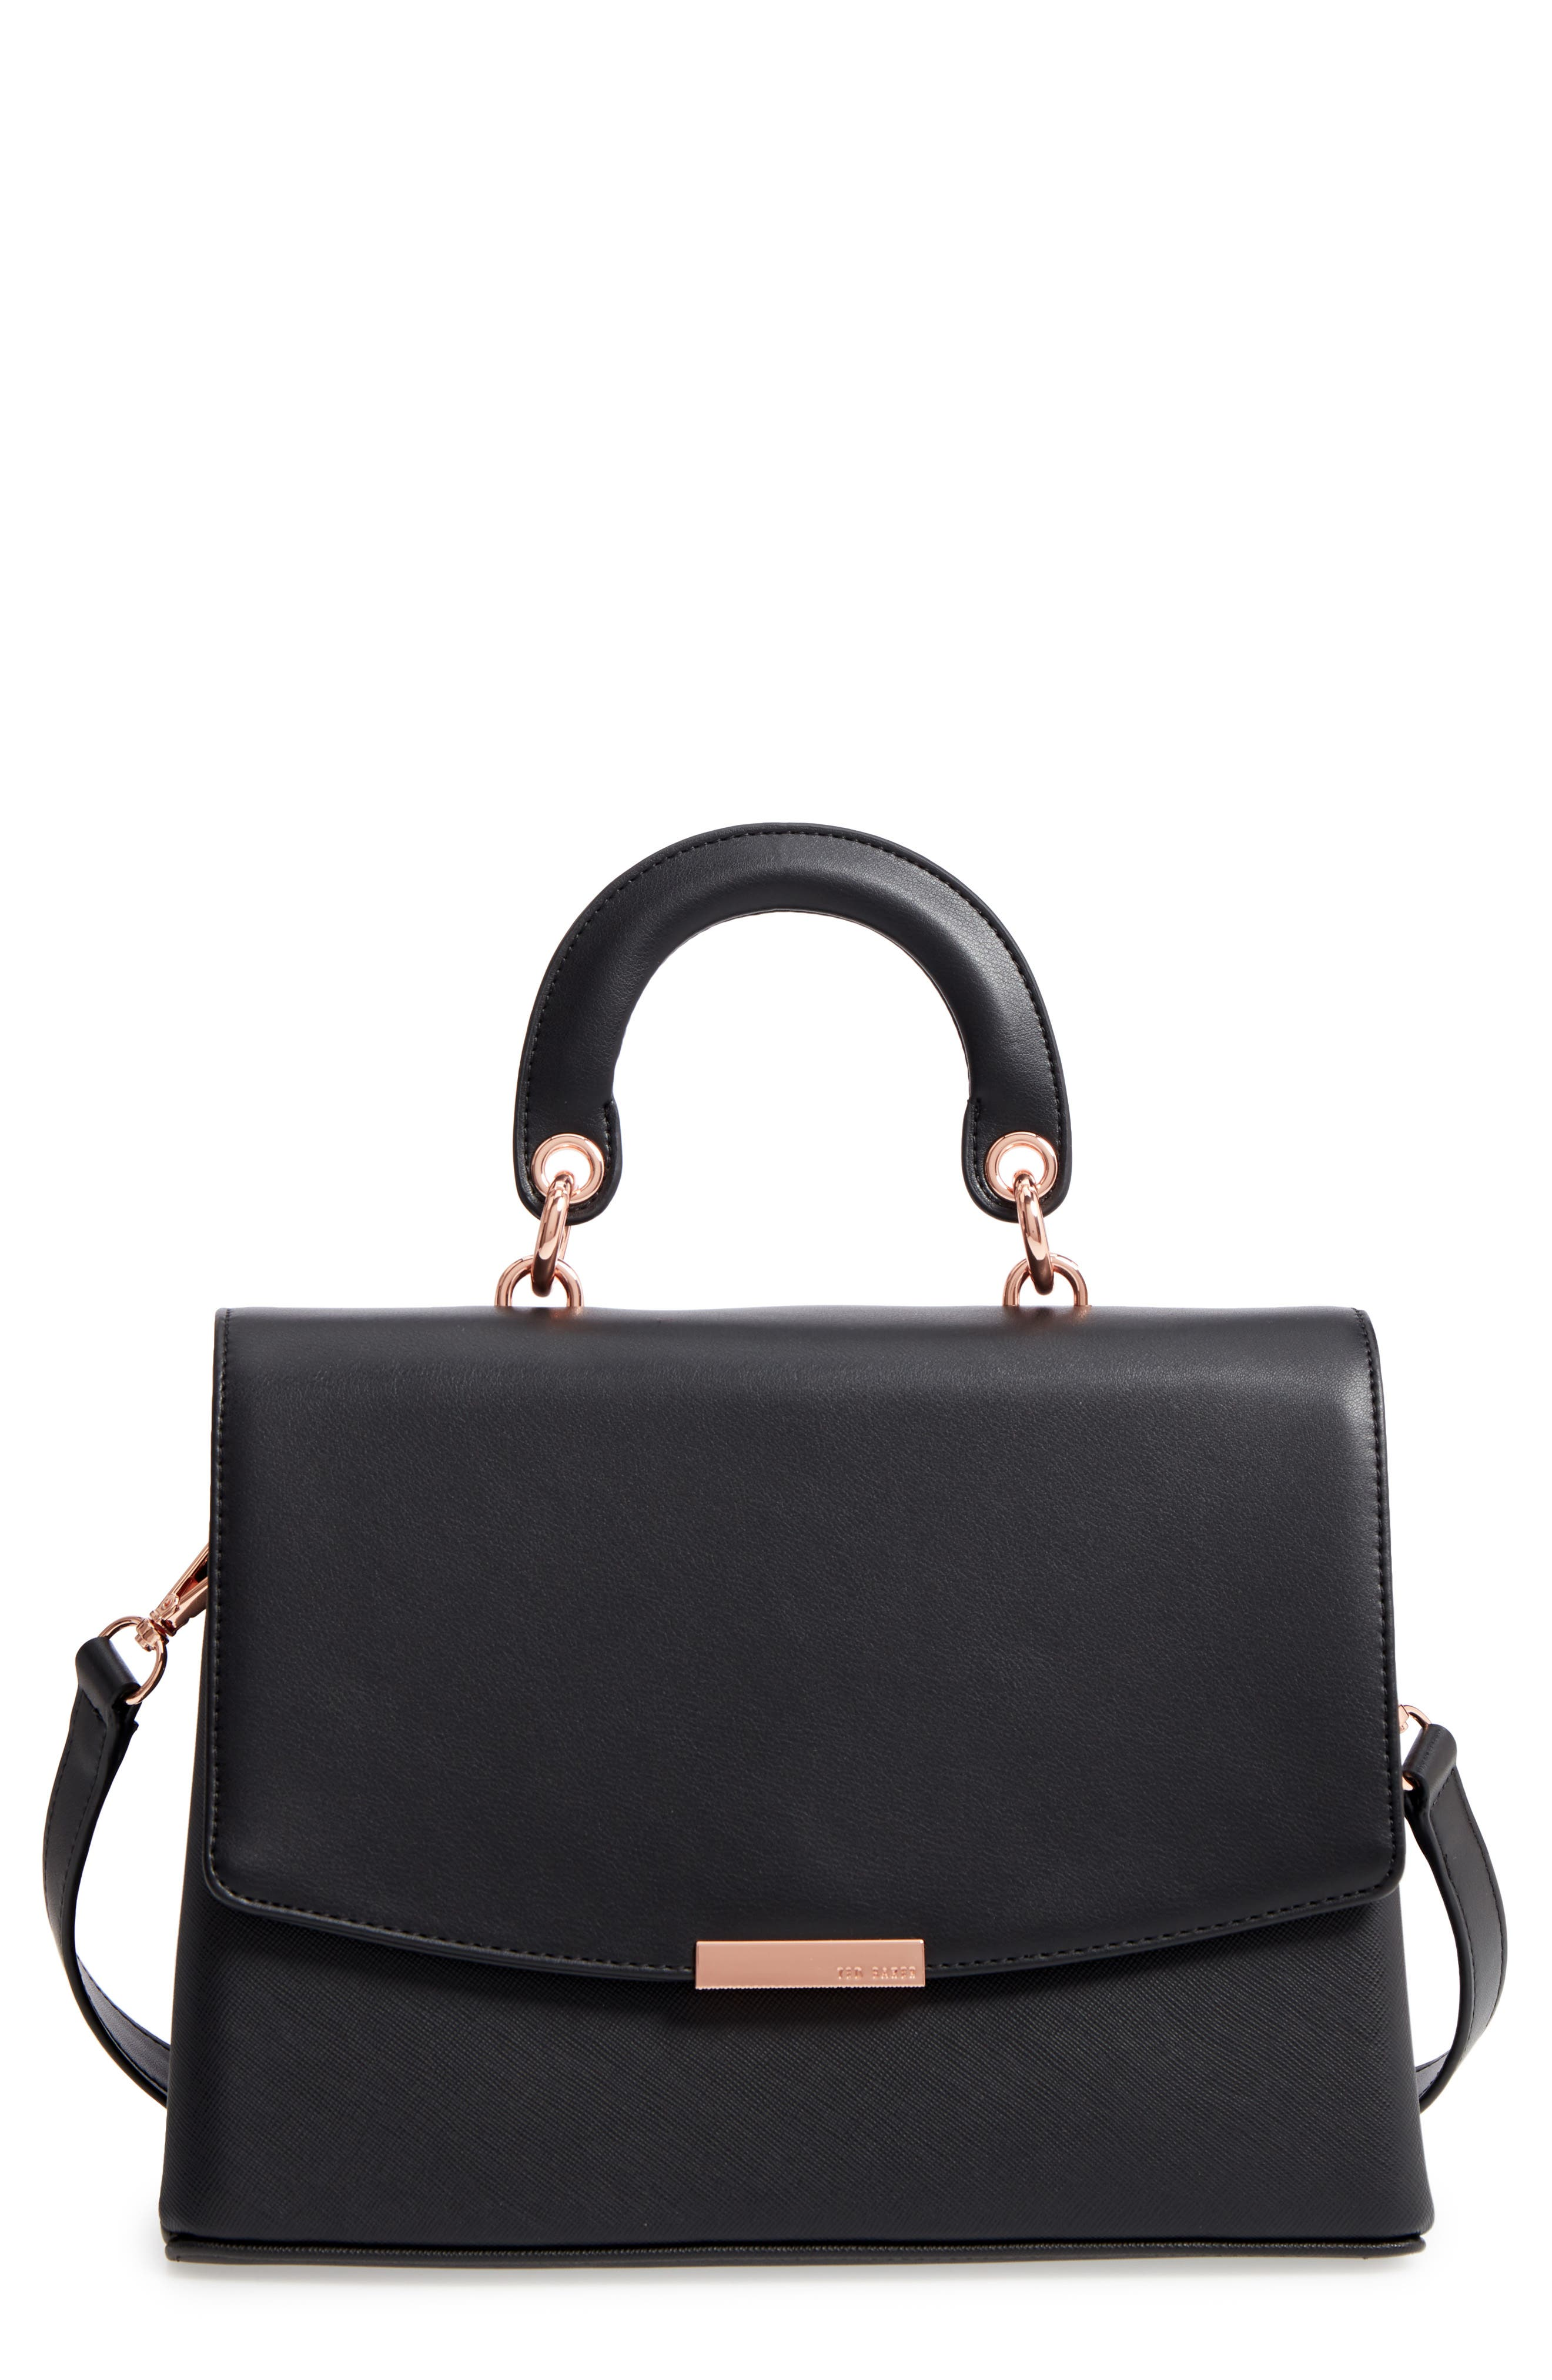 Keiira Lady Bag Faux Leather Top Handle Satchel,                             Main thumbnail 1, color,                             001